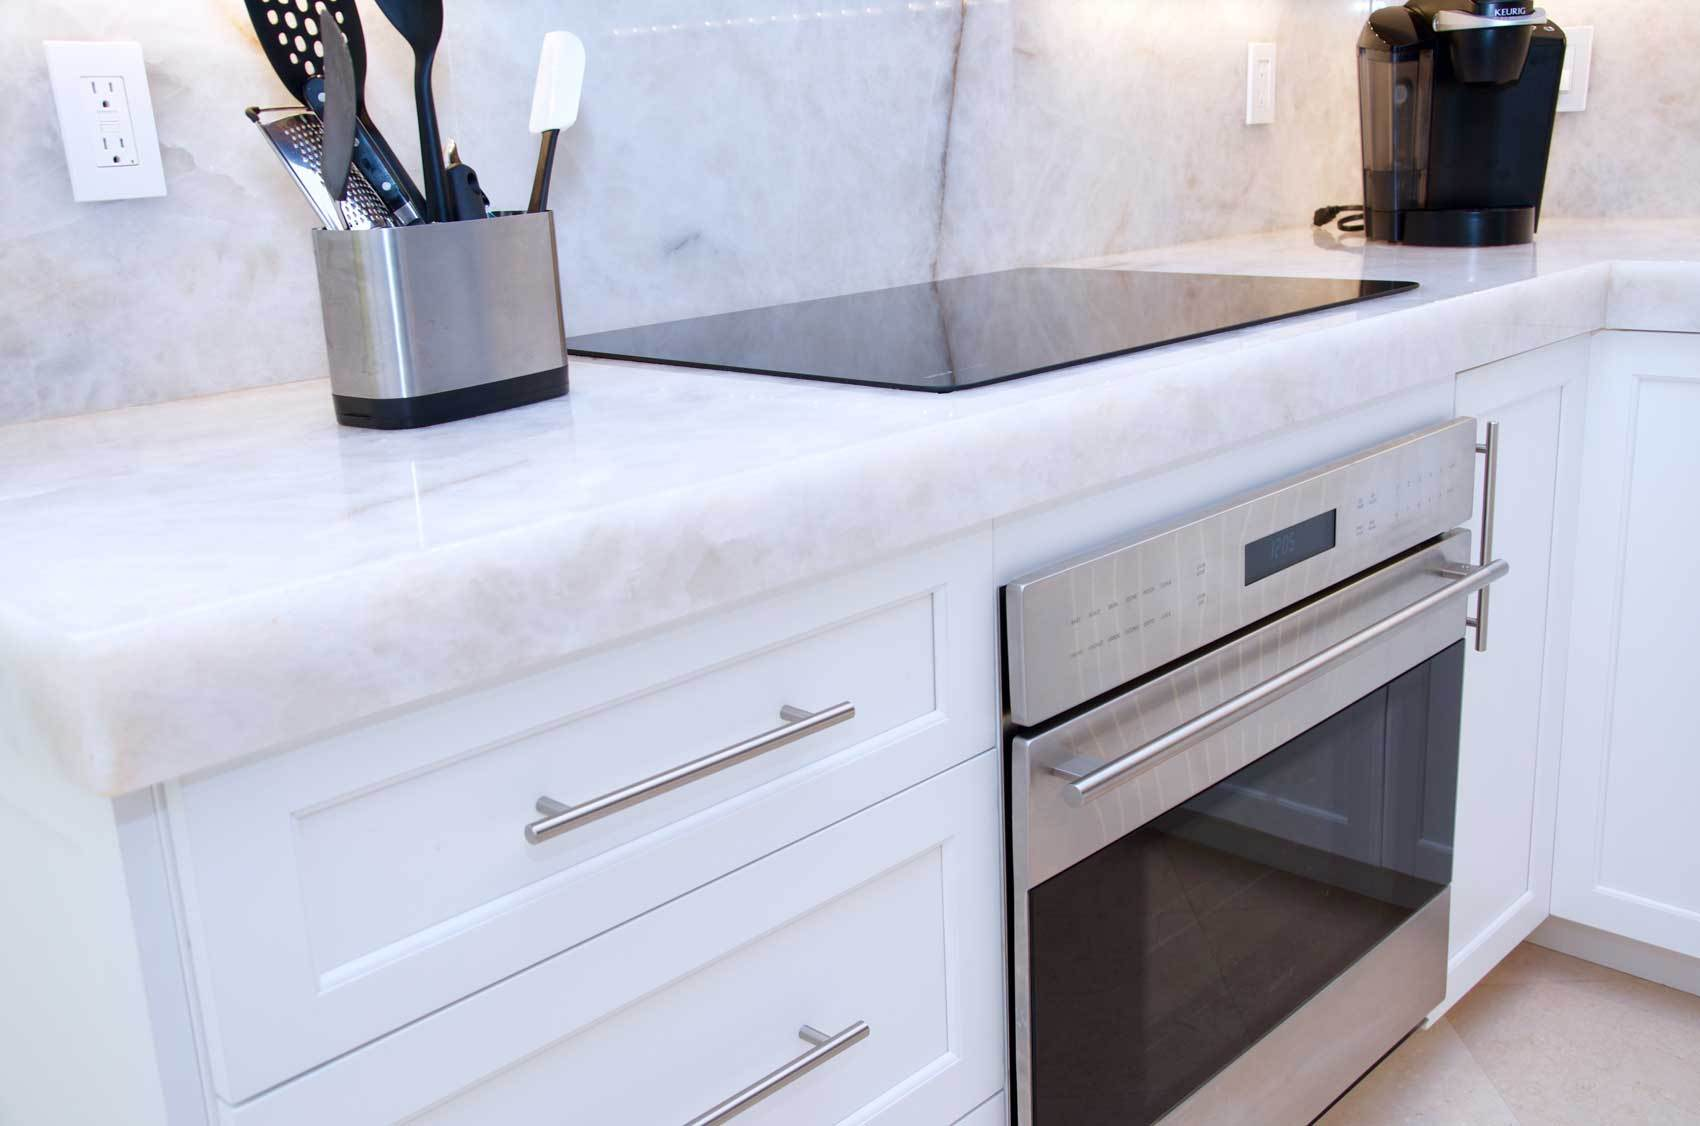 transitional-kitchen-cabinetry-DSC_9809